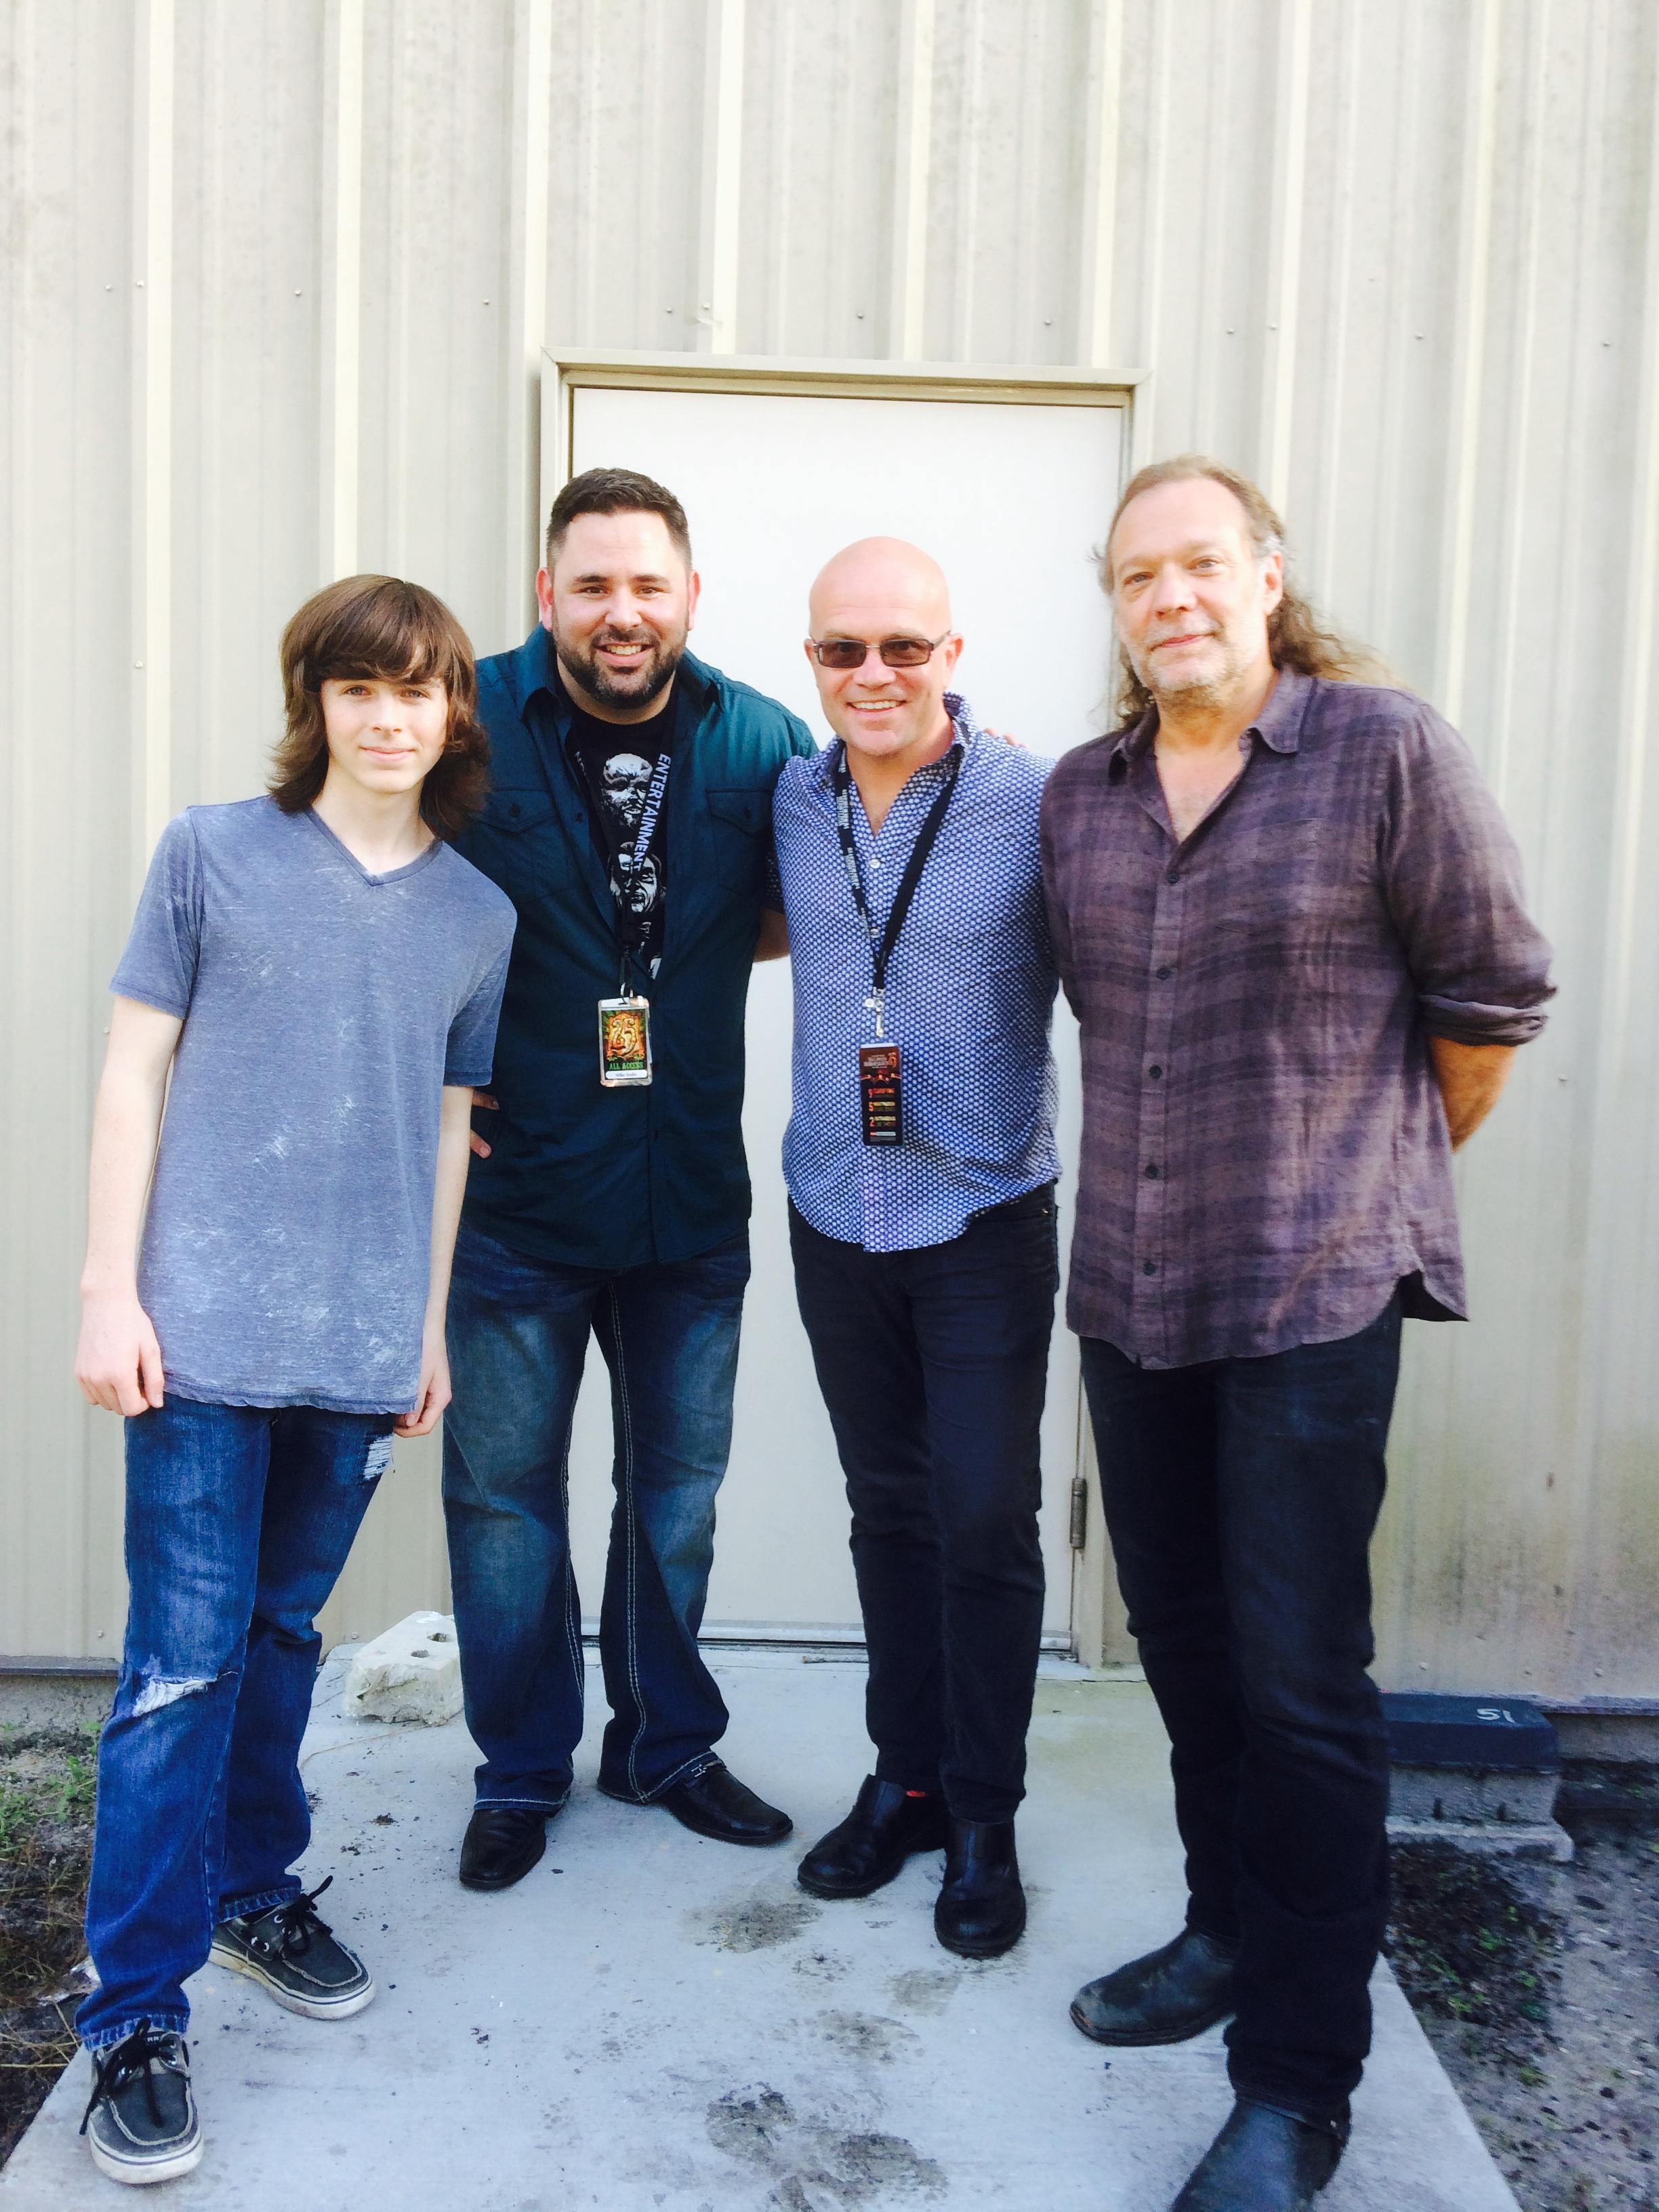 Left to right: Chandler Riggs, Mike Aiello, Jon Waterhouse and Greg Nicotero.